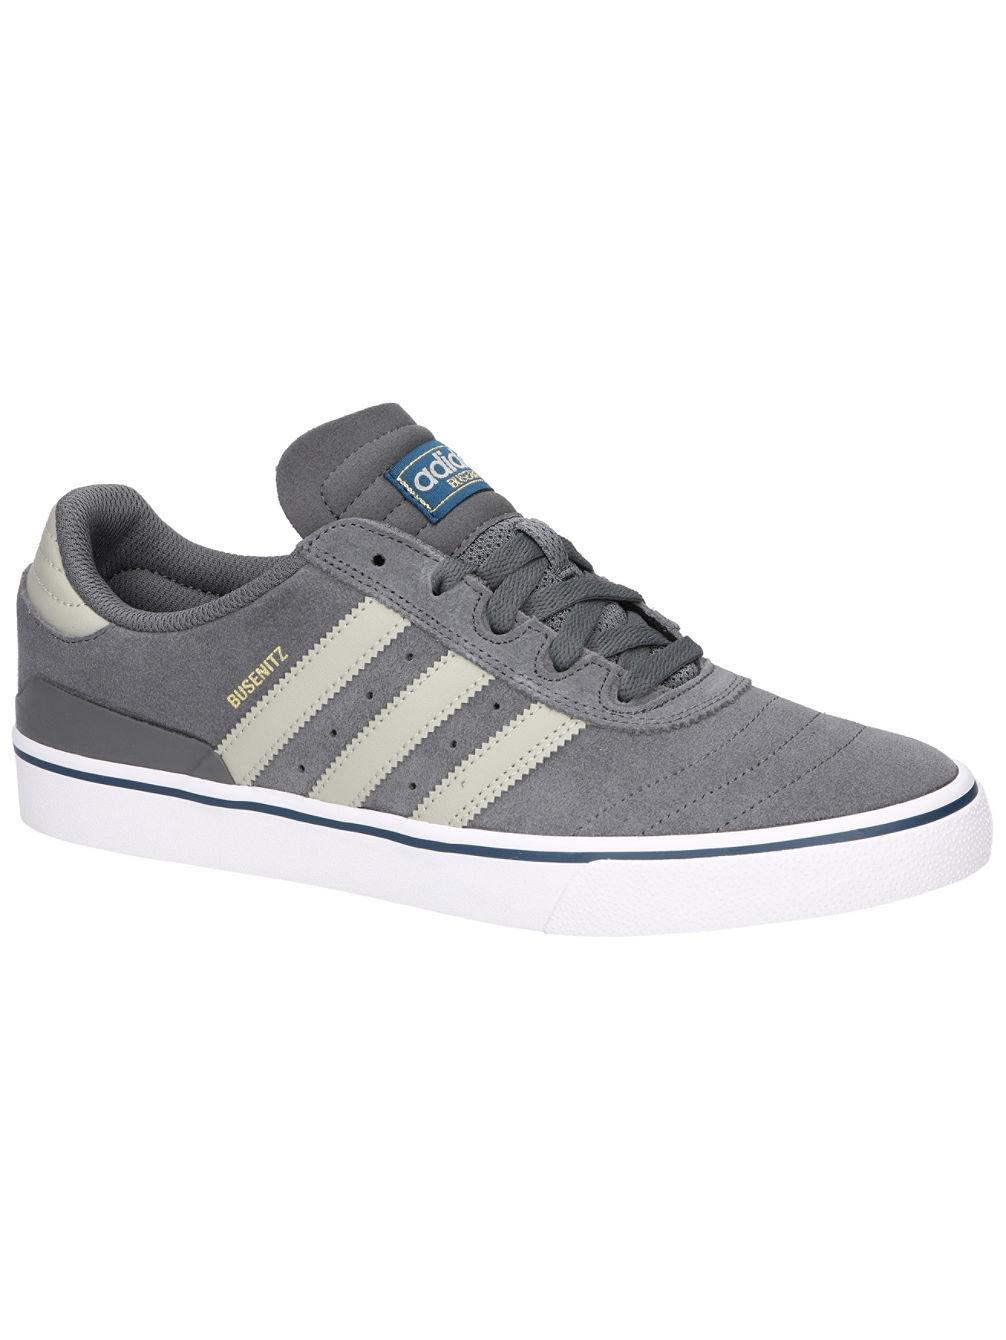 Buy adidas Skateboarding Busenitz Vulc ADV Skate Shoes online at  blue-tomato.com dfc2849819